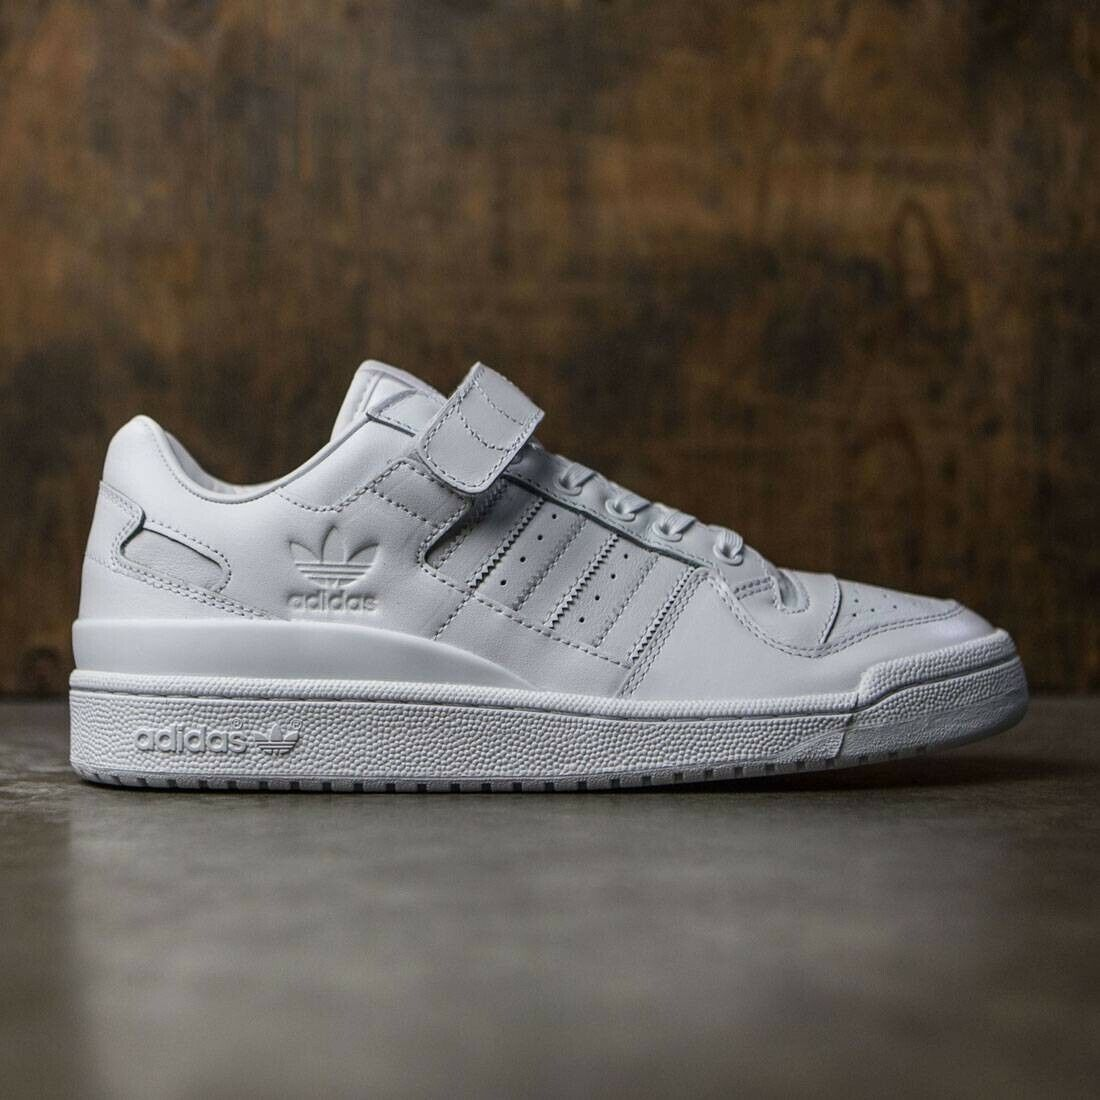 adidas originals low refined forum sneakers